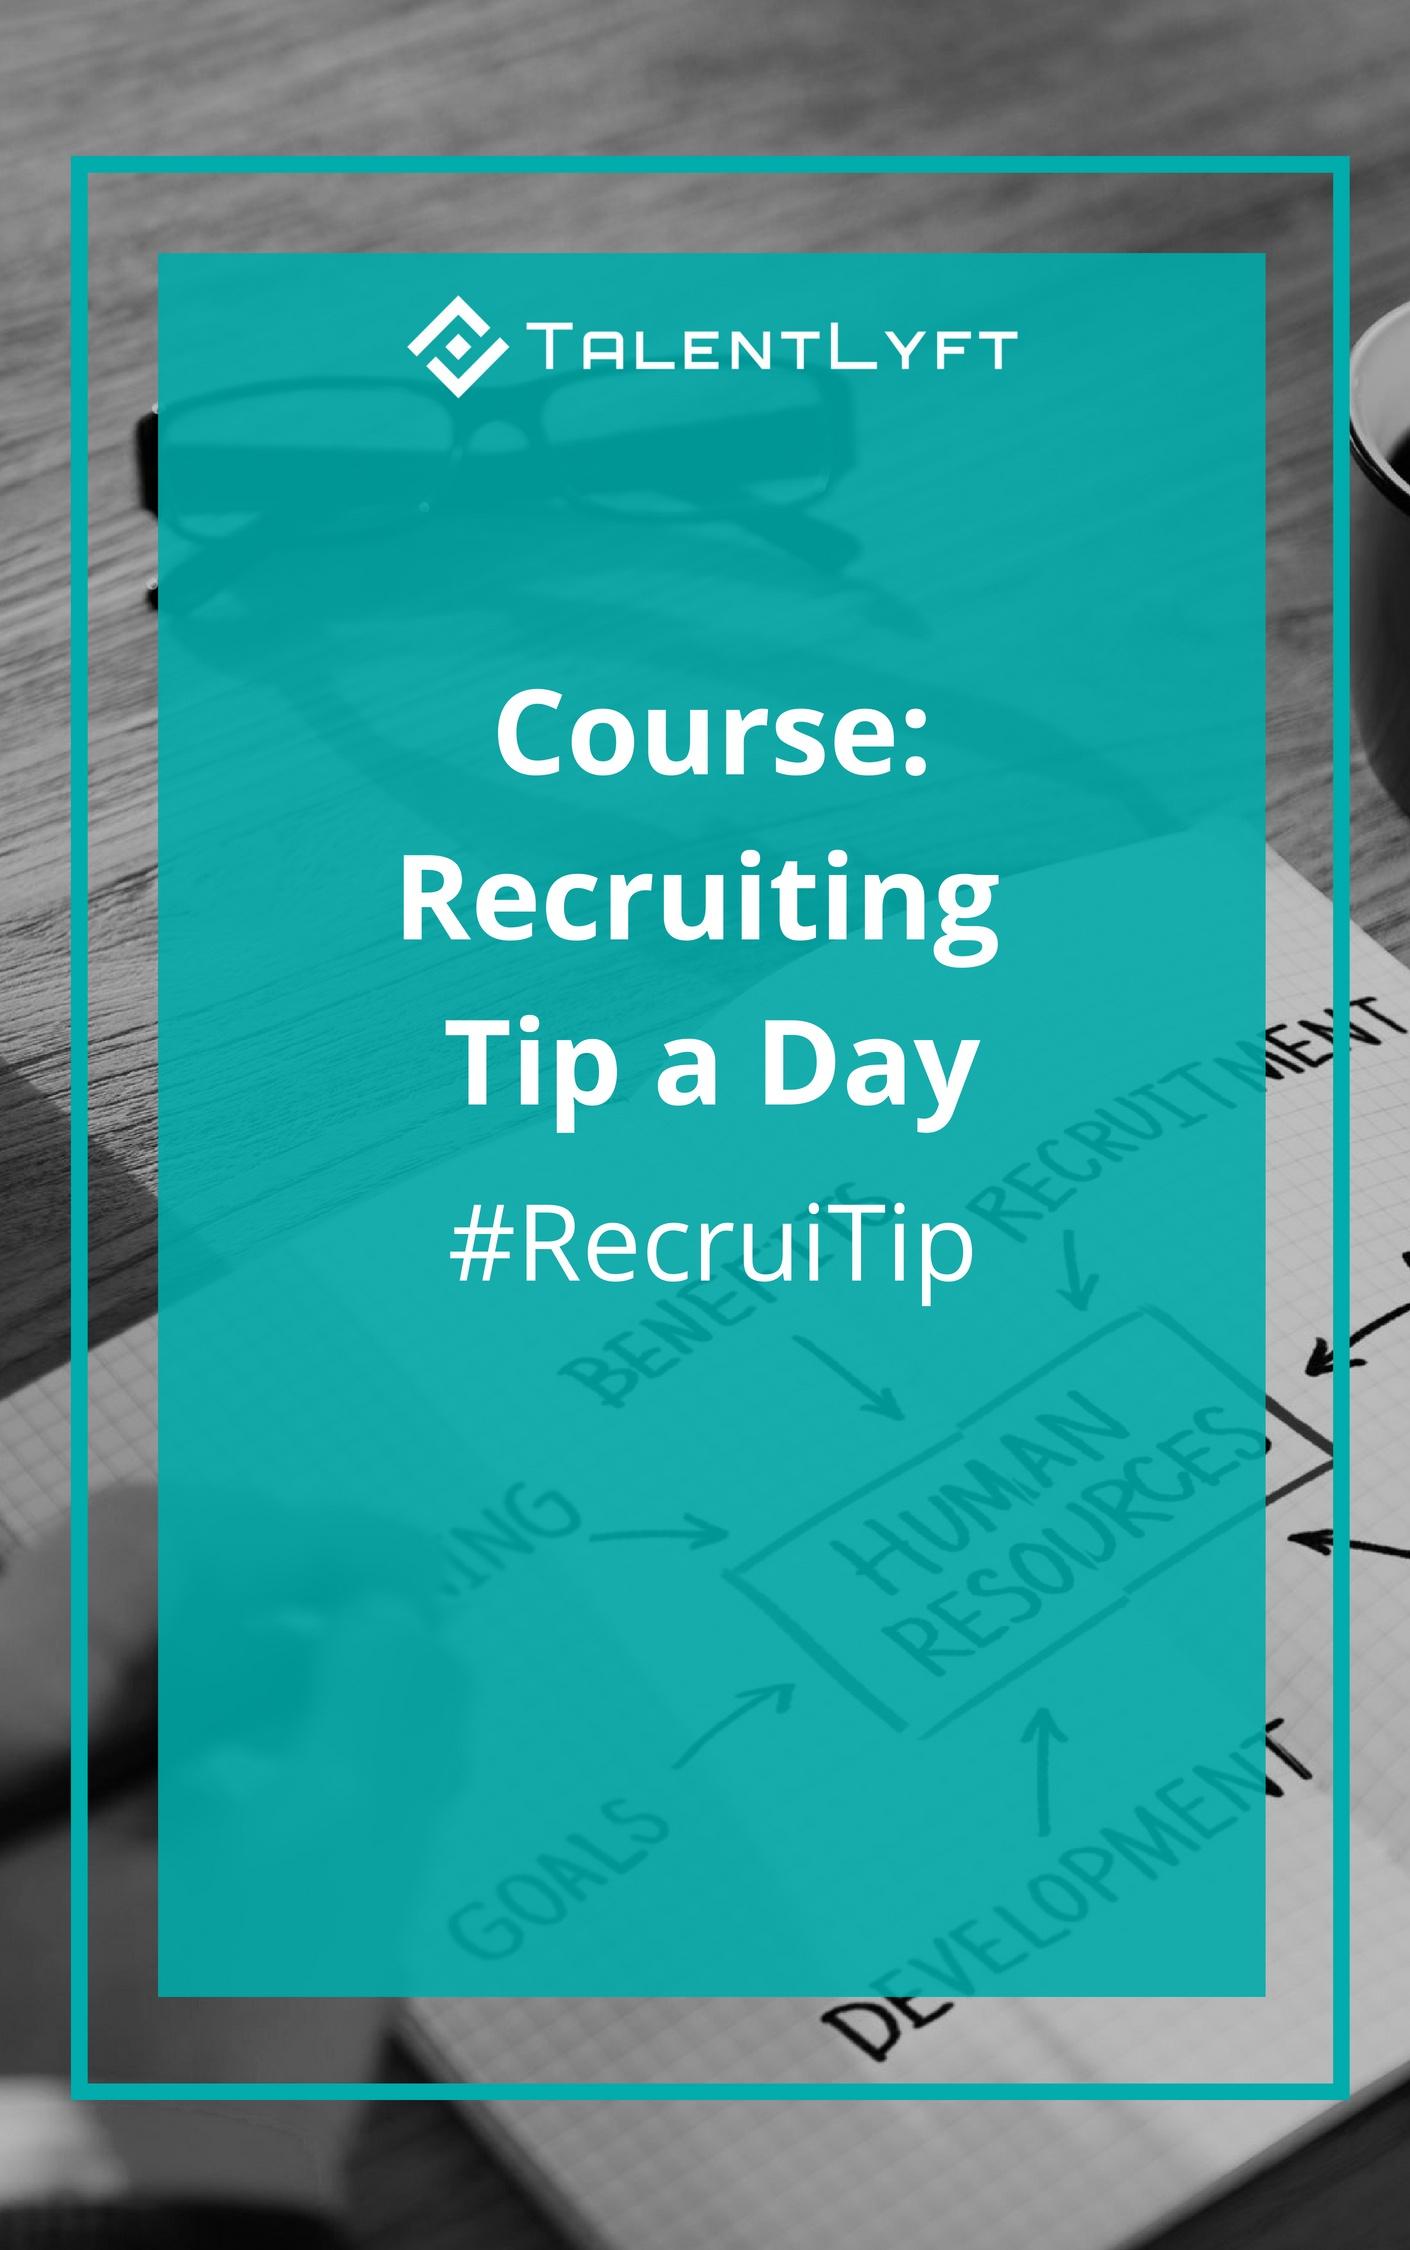 course-recruiting-tip-a-day.jpg